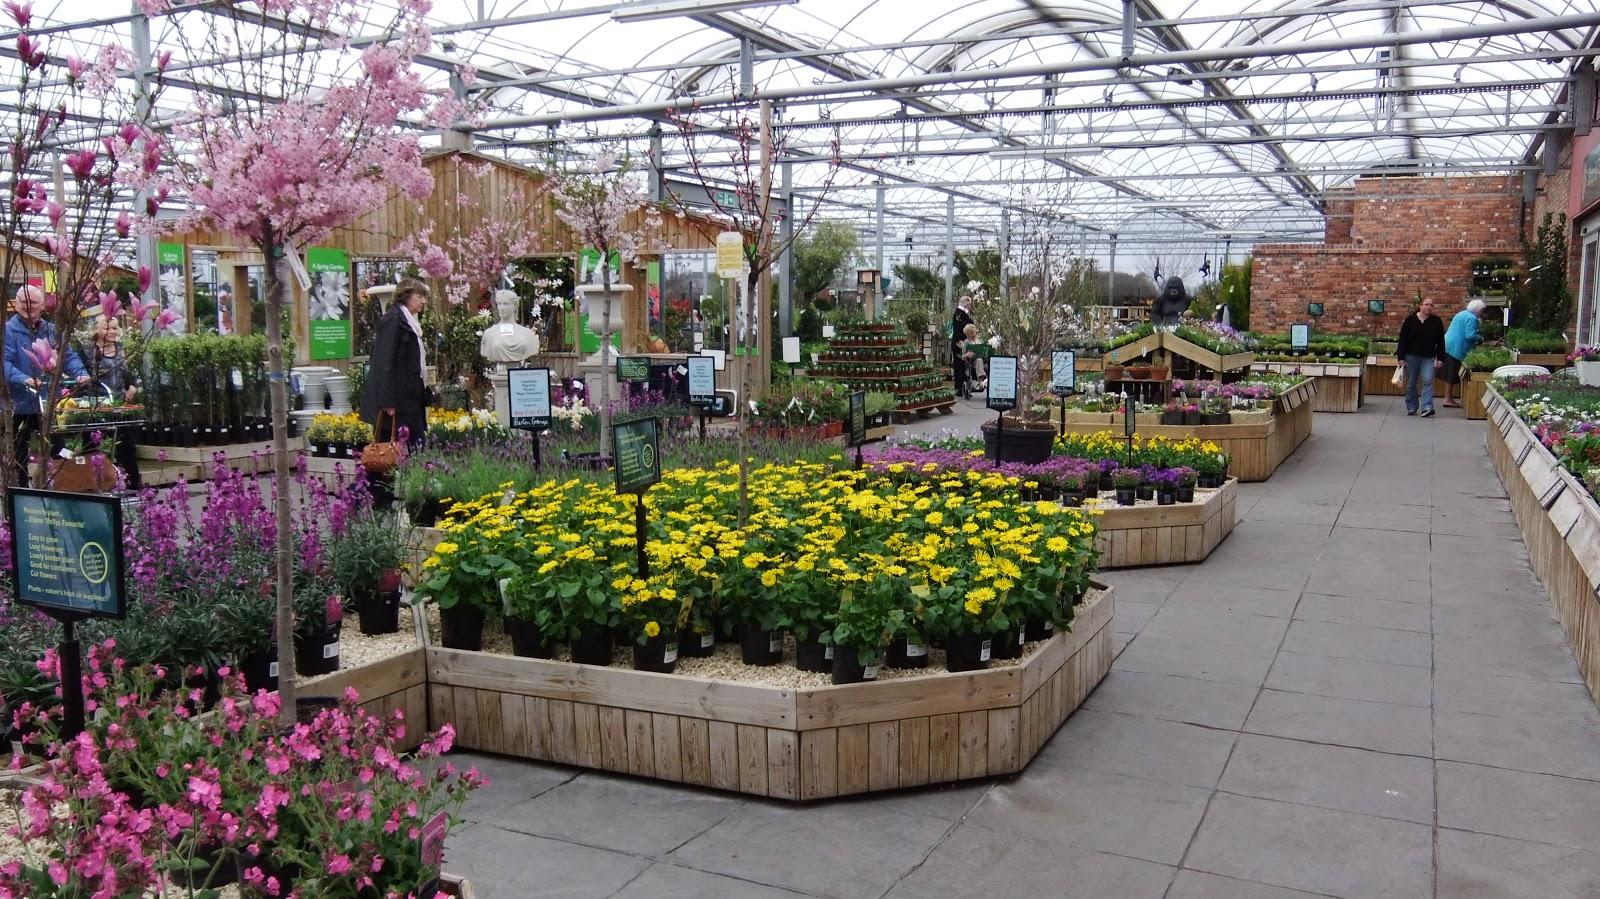 Garden Centre: North West Images: Barton Grange Garden Centre